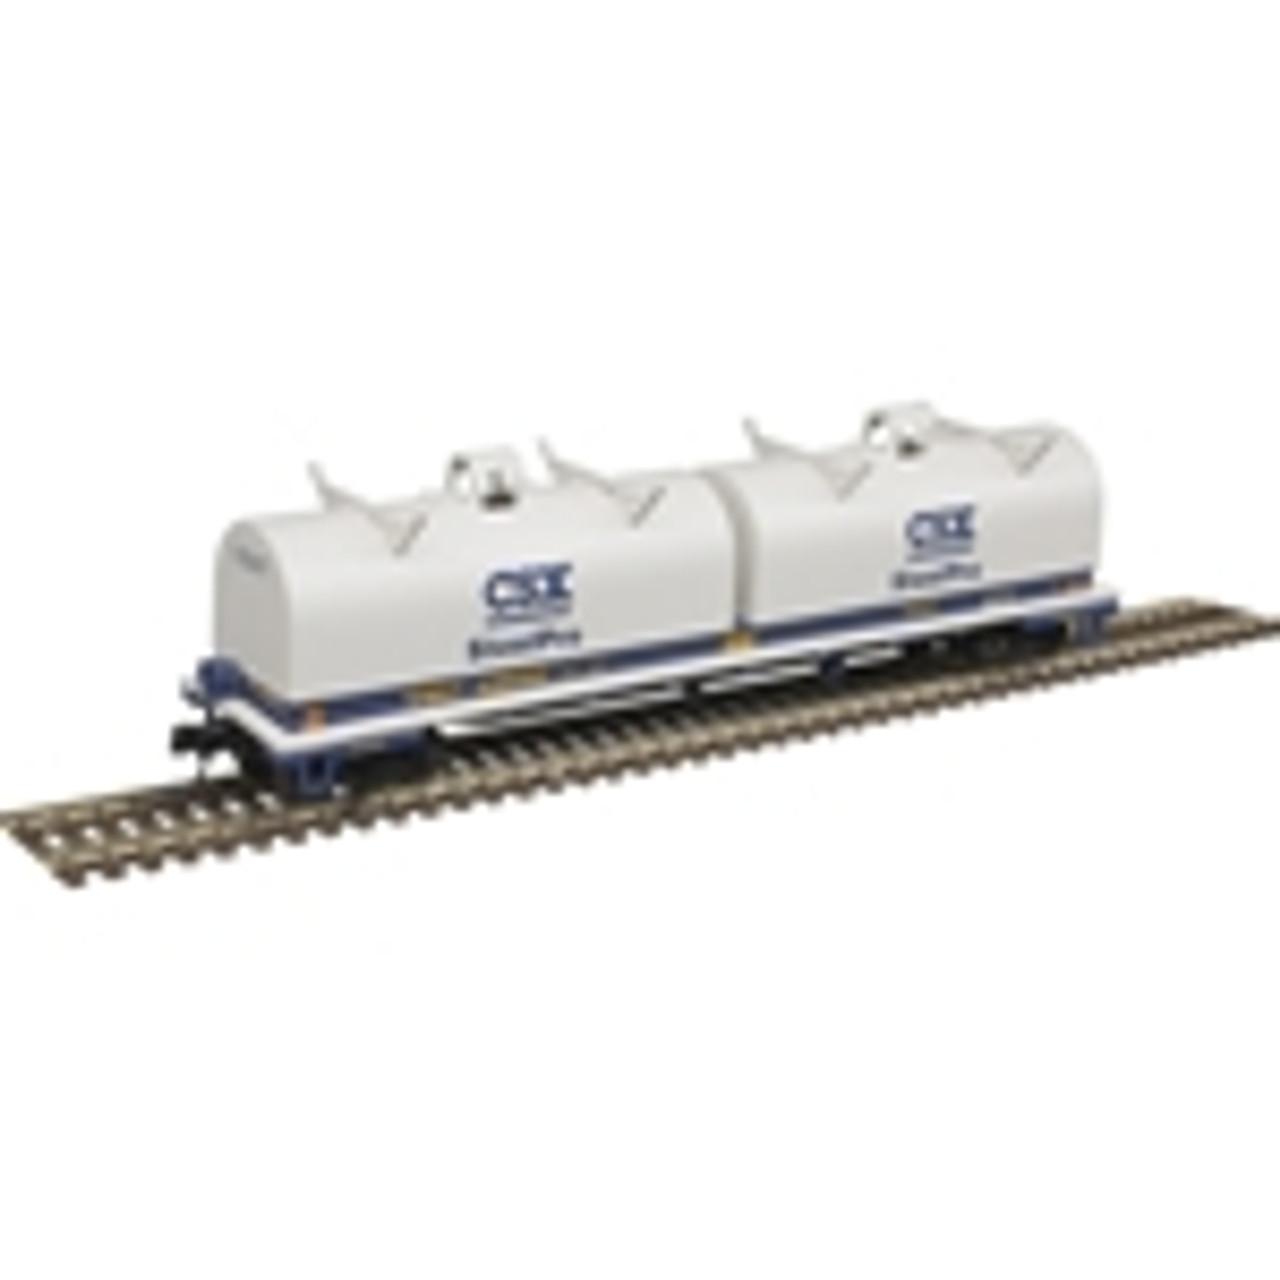 ATLAS 50004654 Cushion Coil Car - CSXT Steel Pro #496067 (SCALE=N) Part # 150-50004654